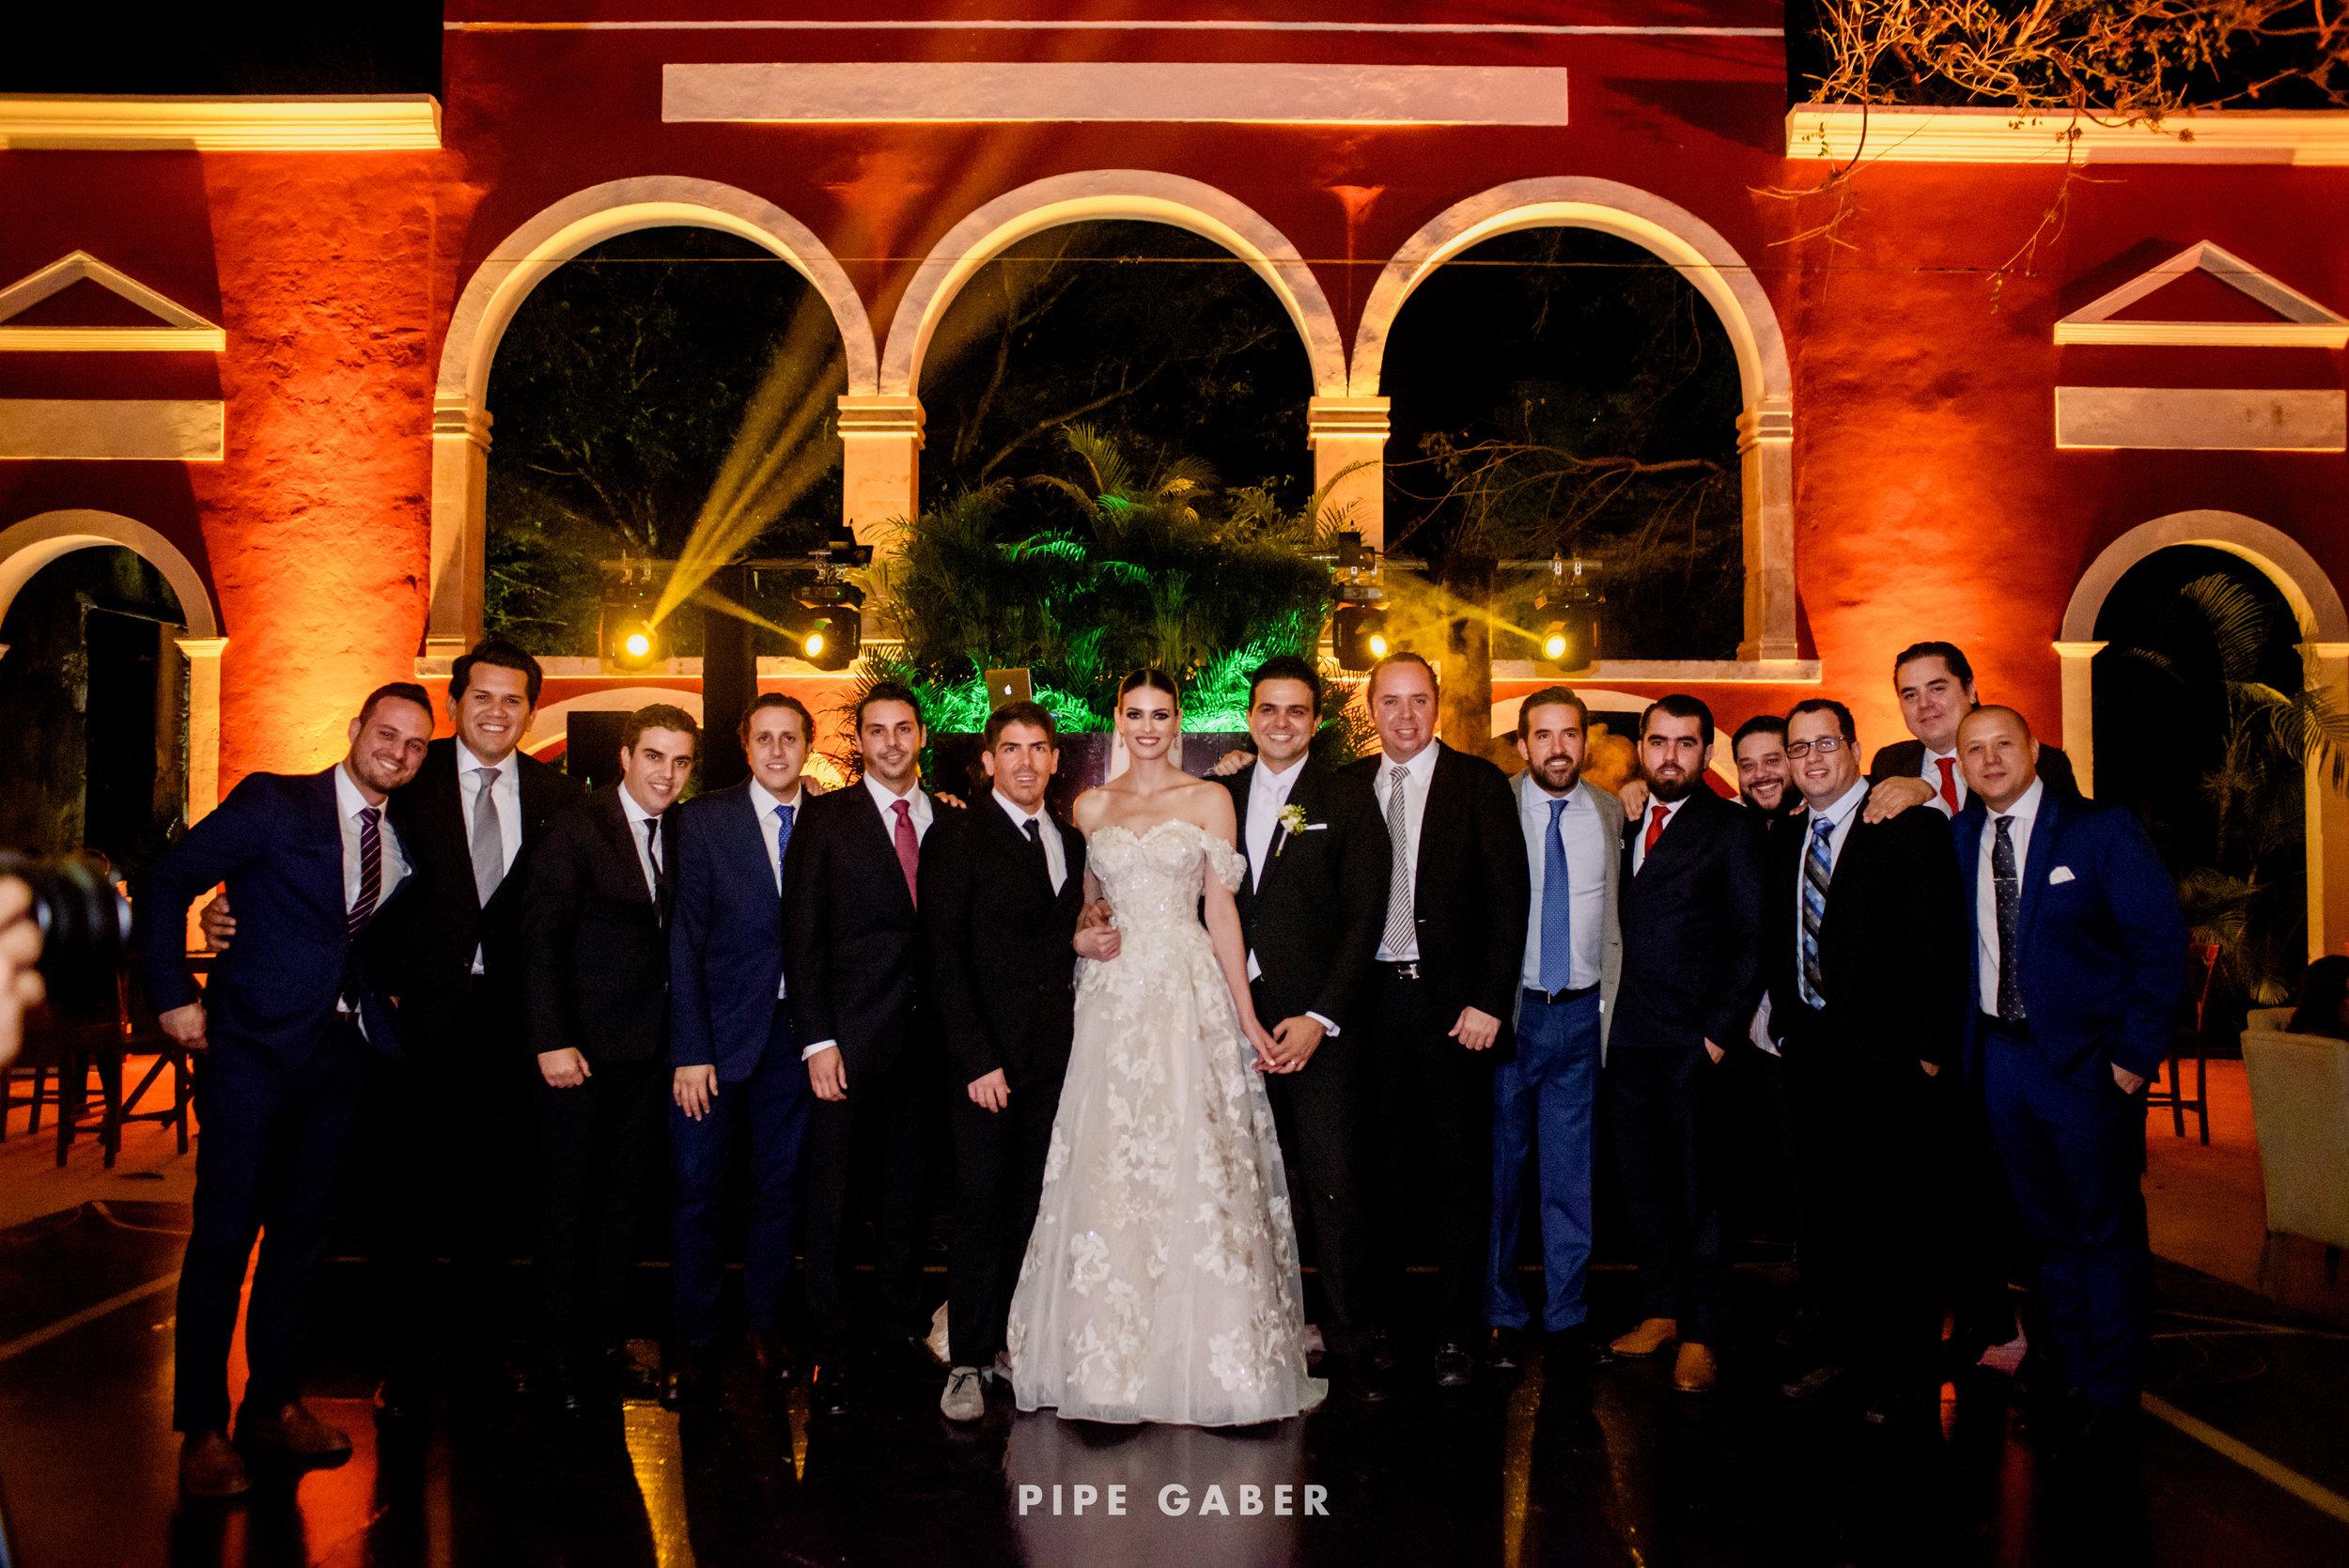 18_02_03_WEDDING_ALEXIS_ABIMERHI_ERICK_APT_2256.jpg